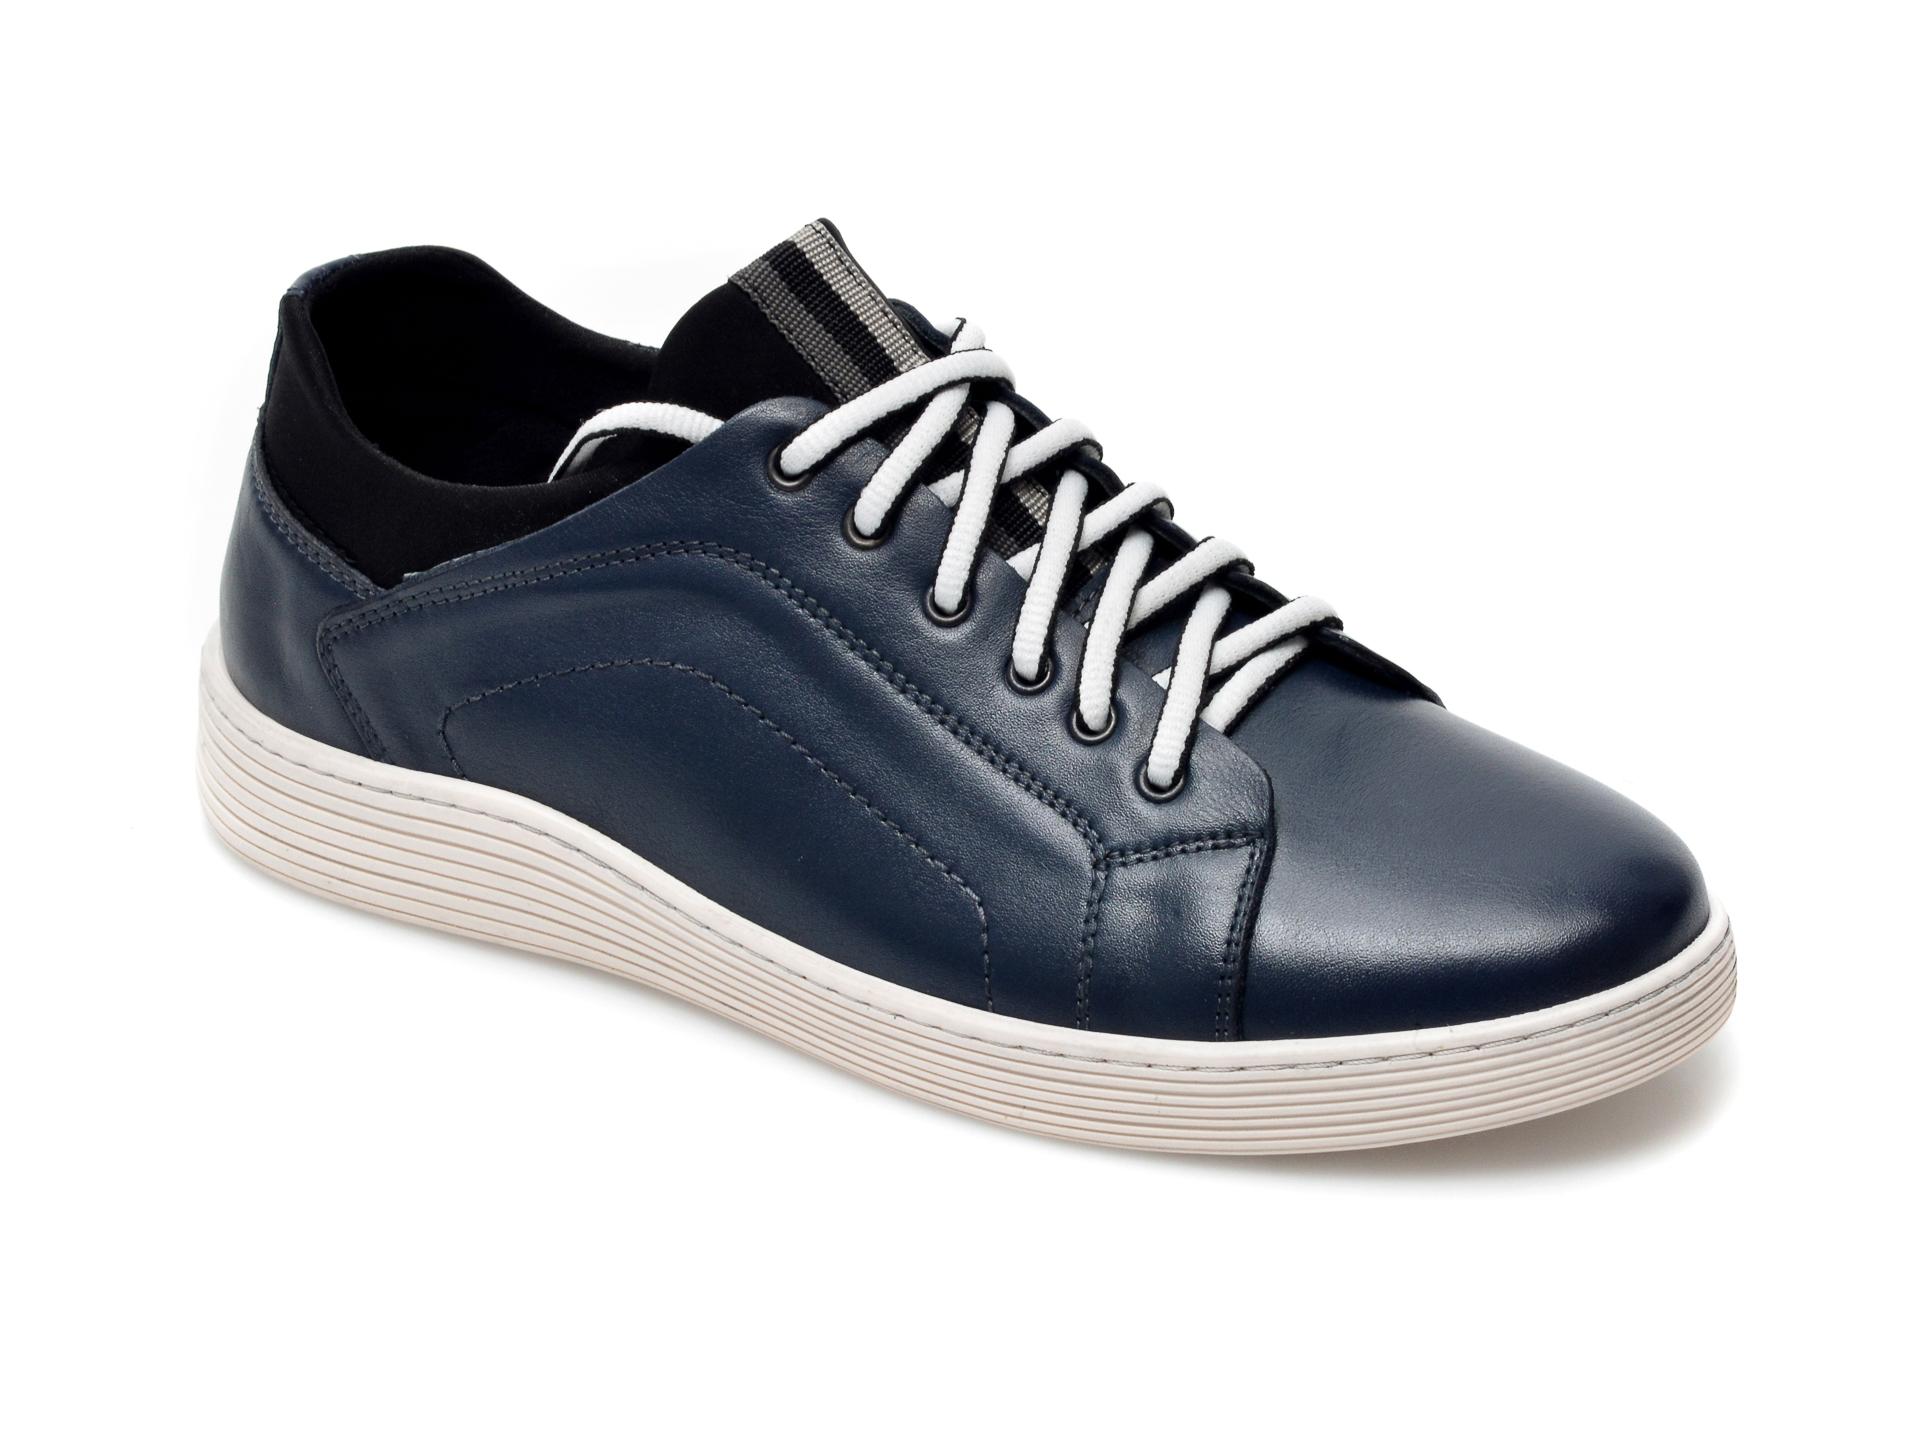 Pantofi OTTER bleumarin, 940, din piele naturala imagine otter.ro 2021